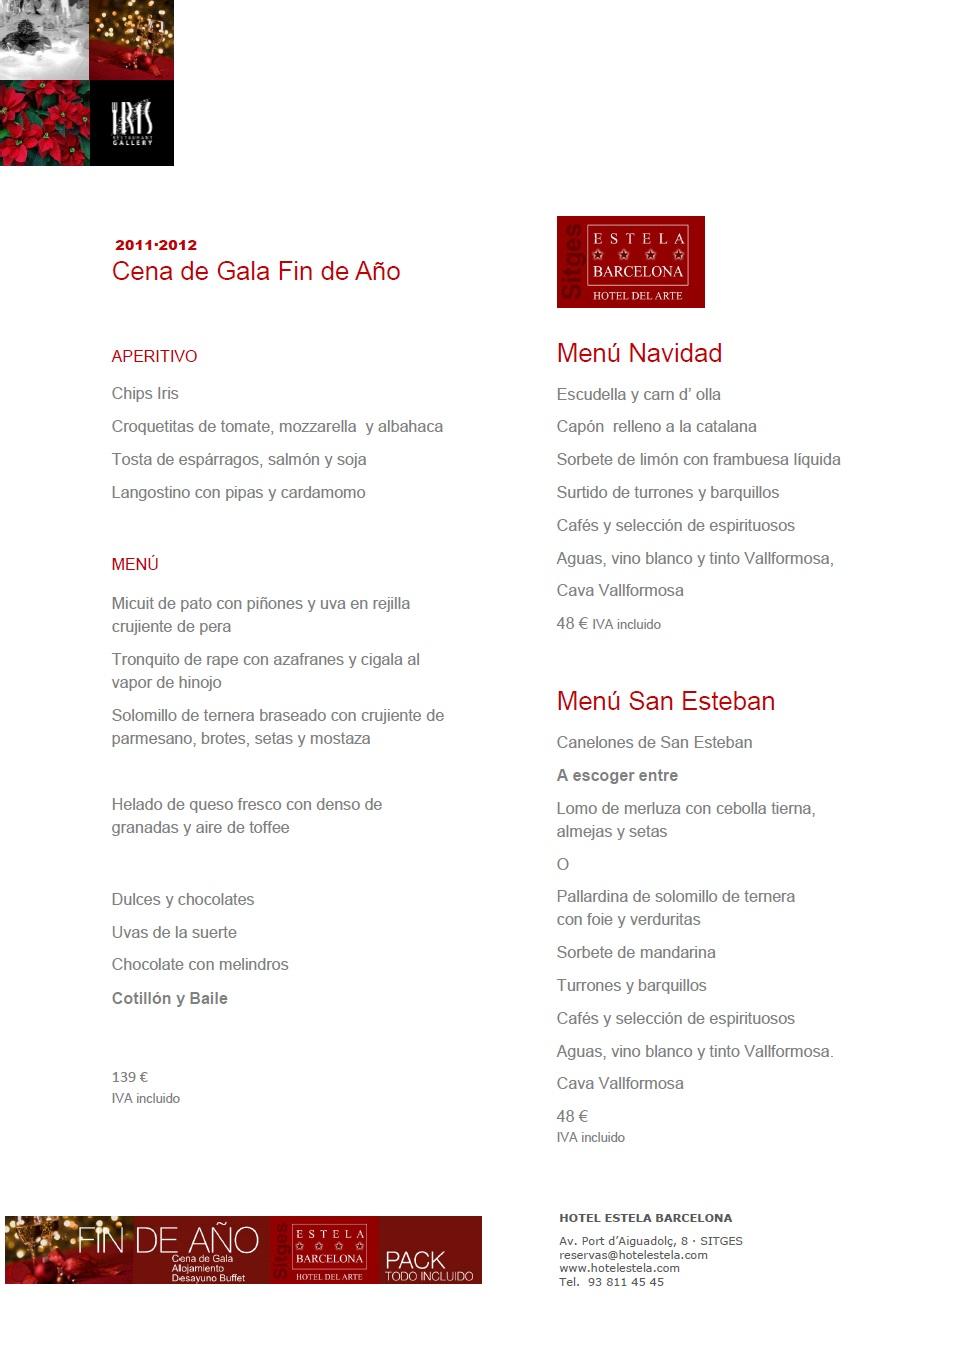 Hotel estela barcelona sitges hotel del arte sitges - Menu cena de nochevieja ...